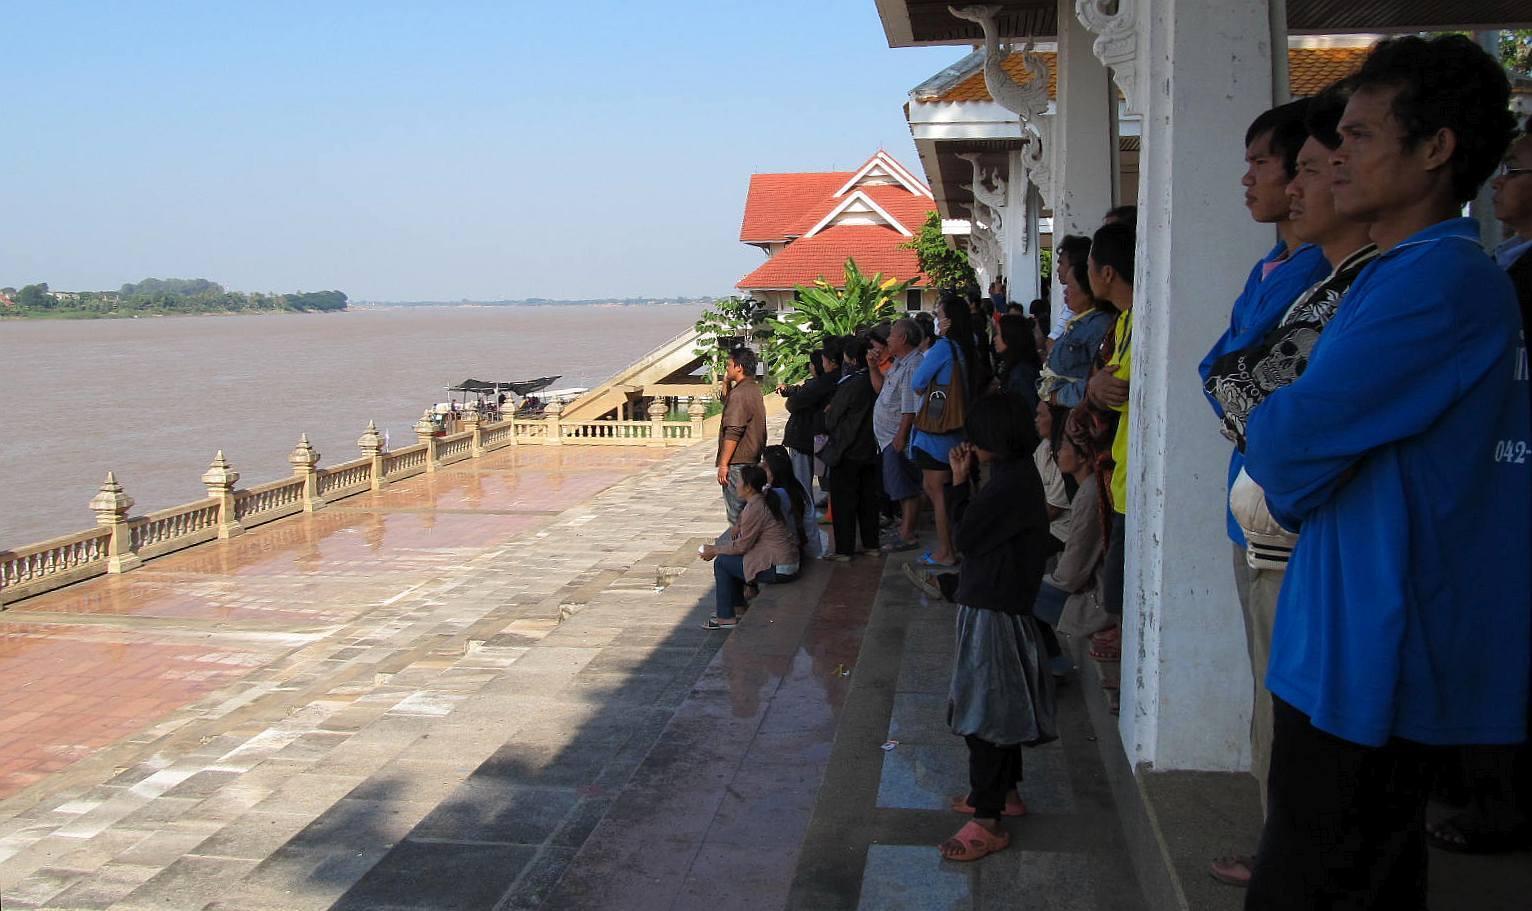 Thajci na břehu Mekongu pozorují Nágu. Nong Khai Thajsko 2010